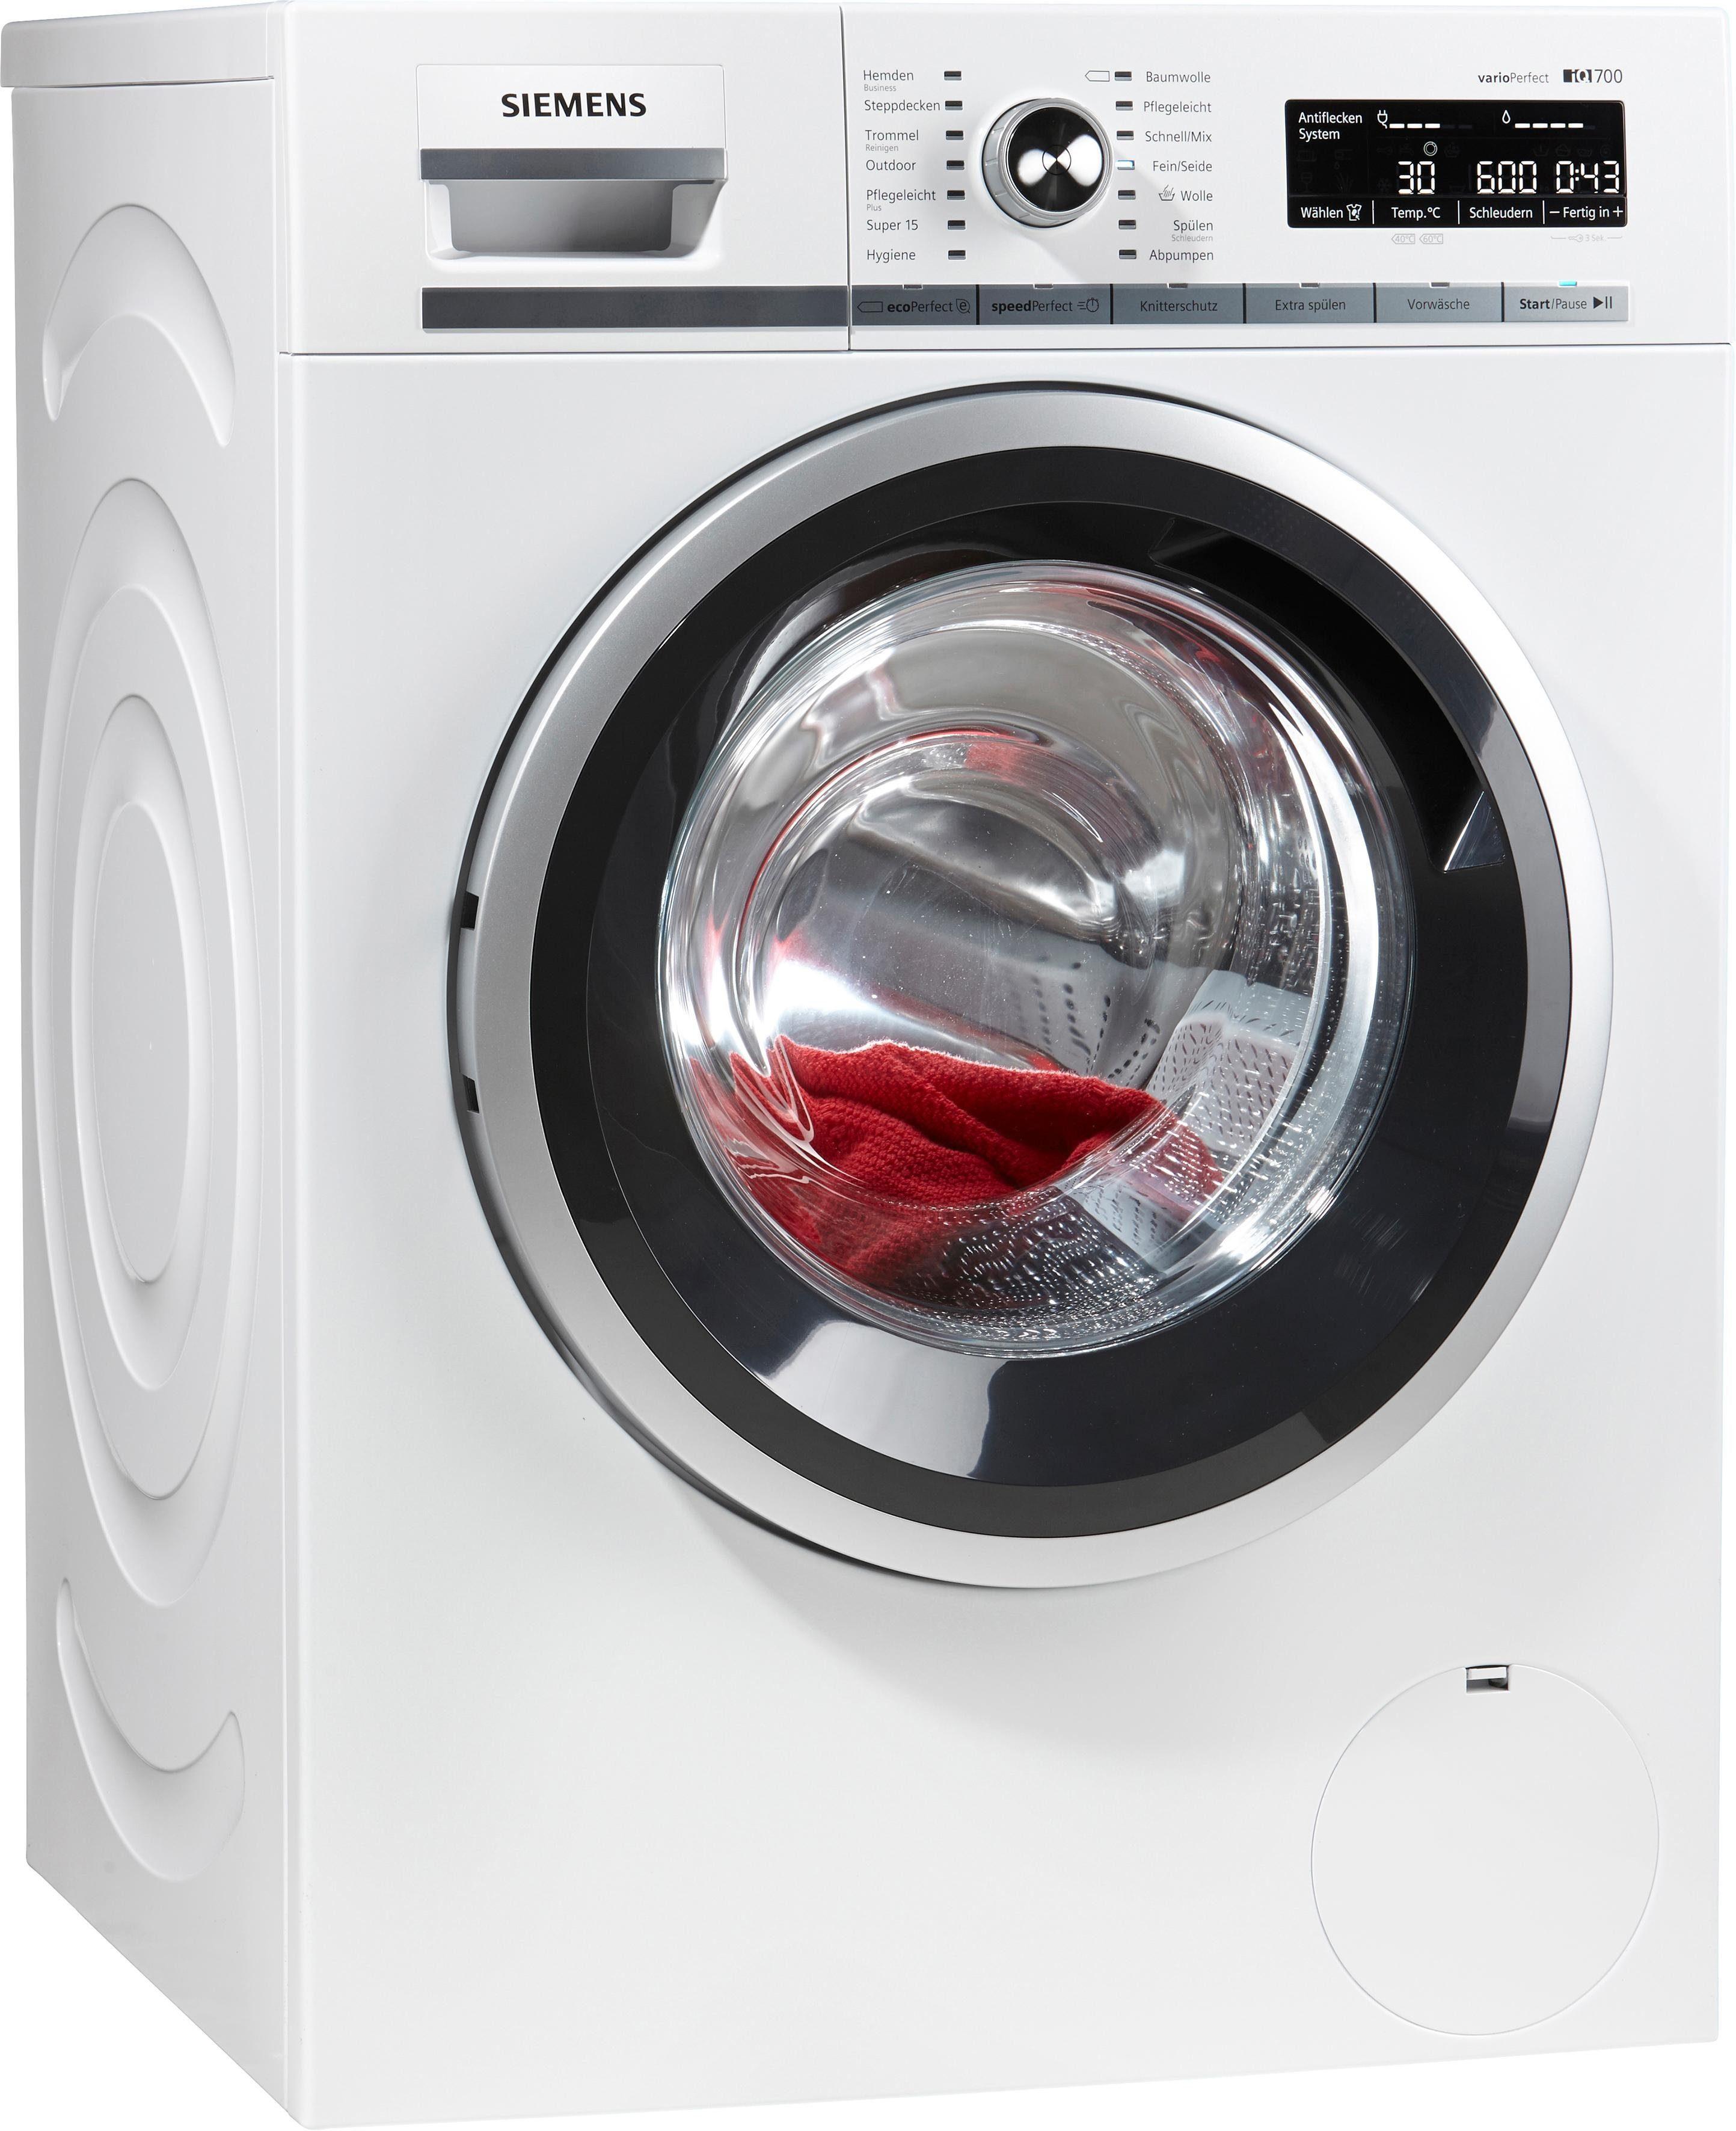 SIEMENS Waschmaschine WM16W540, A+++, 8 kg, 1600 U/Min